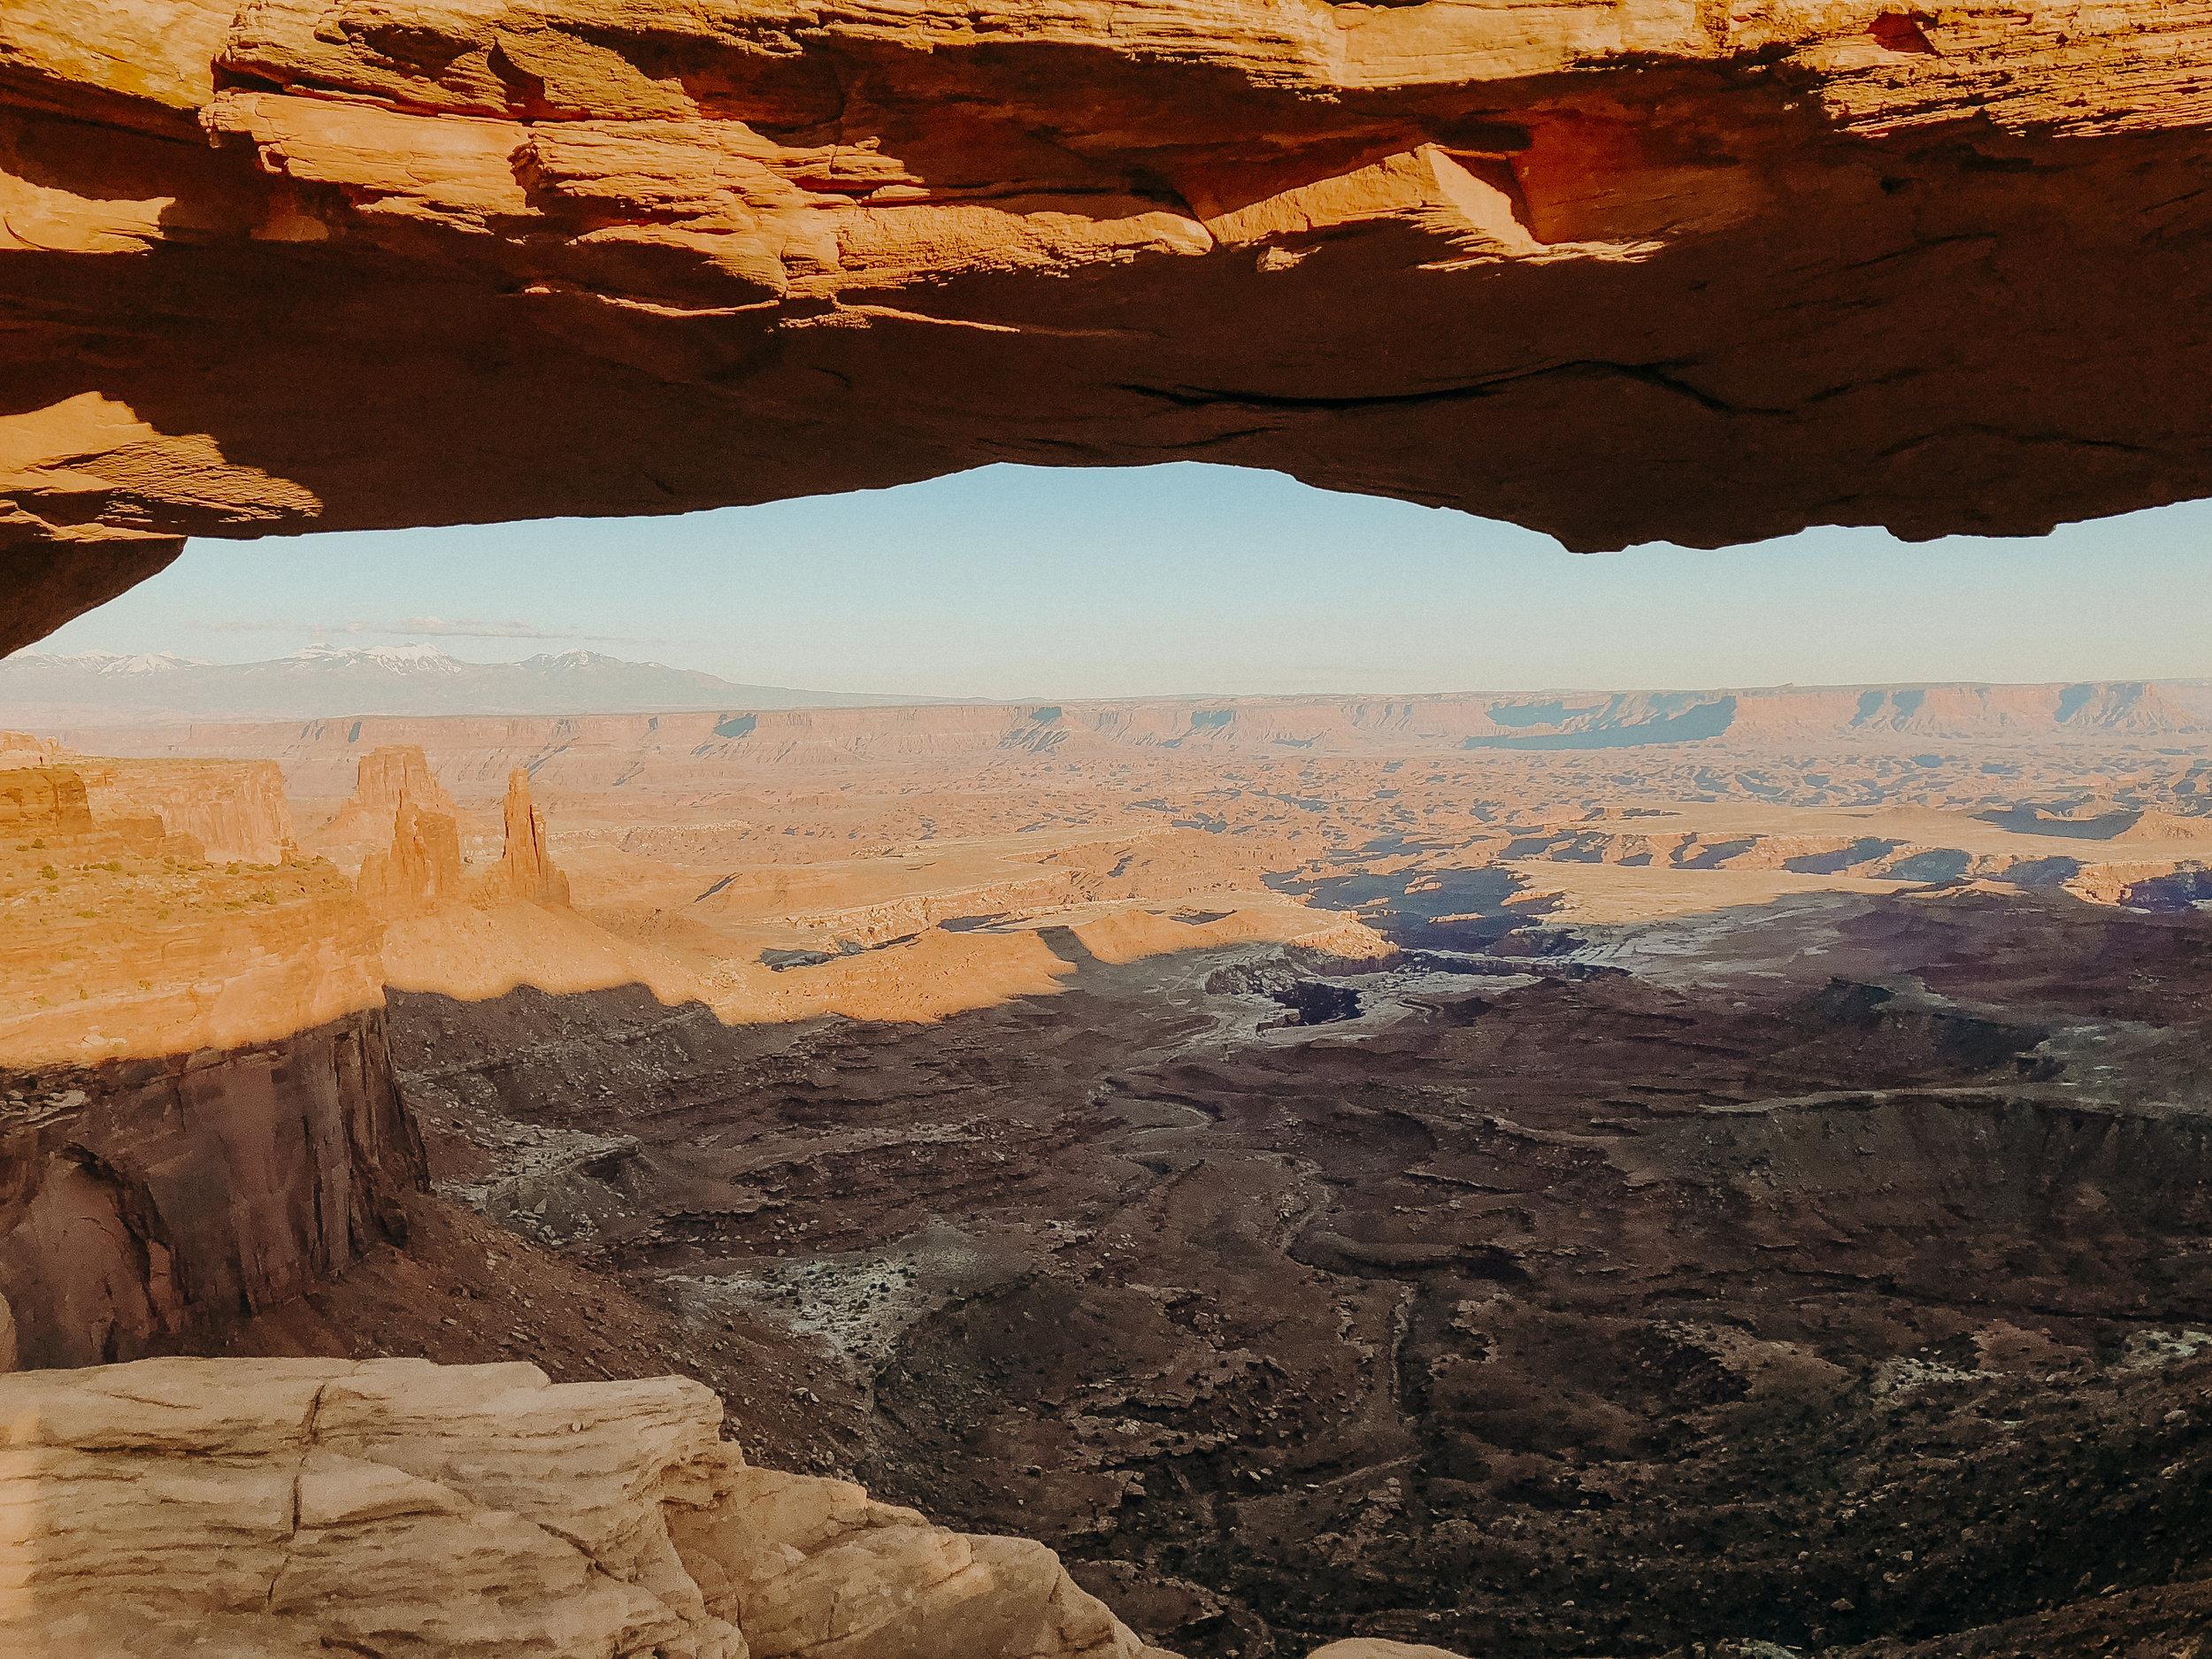 canyonlands national park travel blog-19.jpg